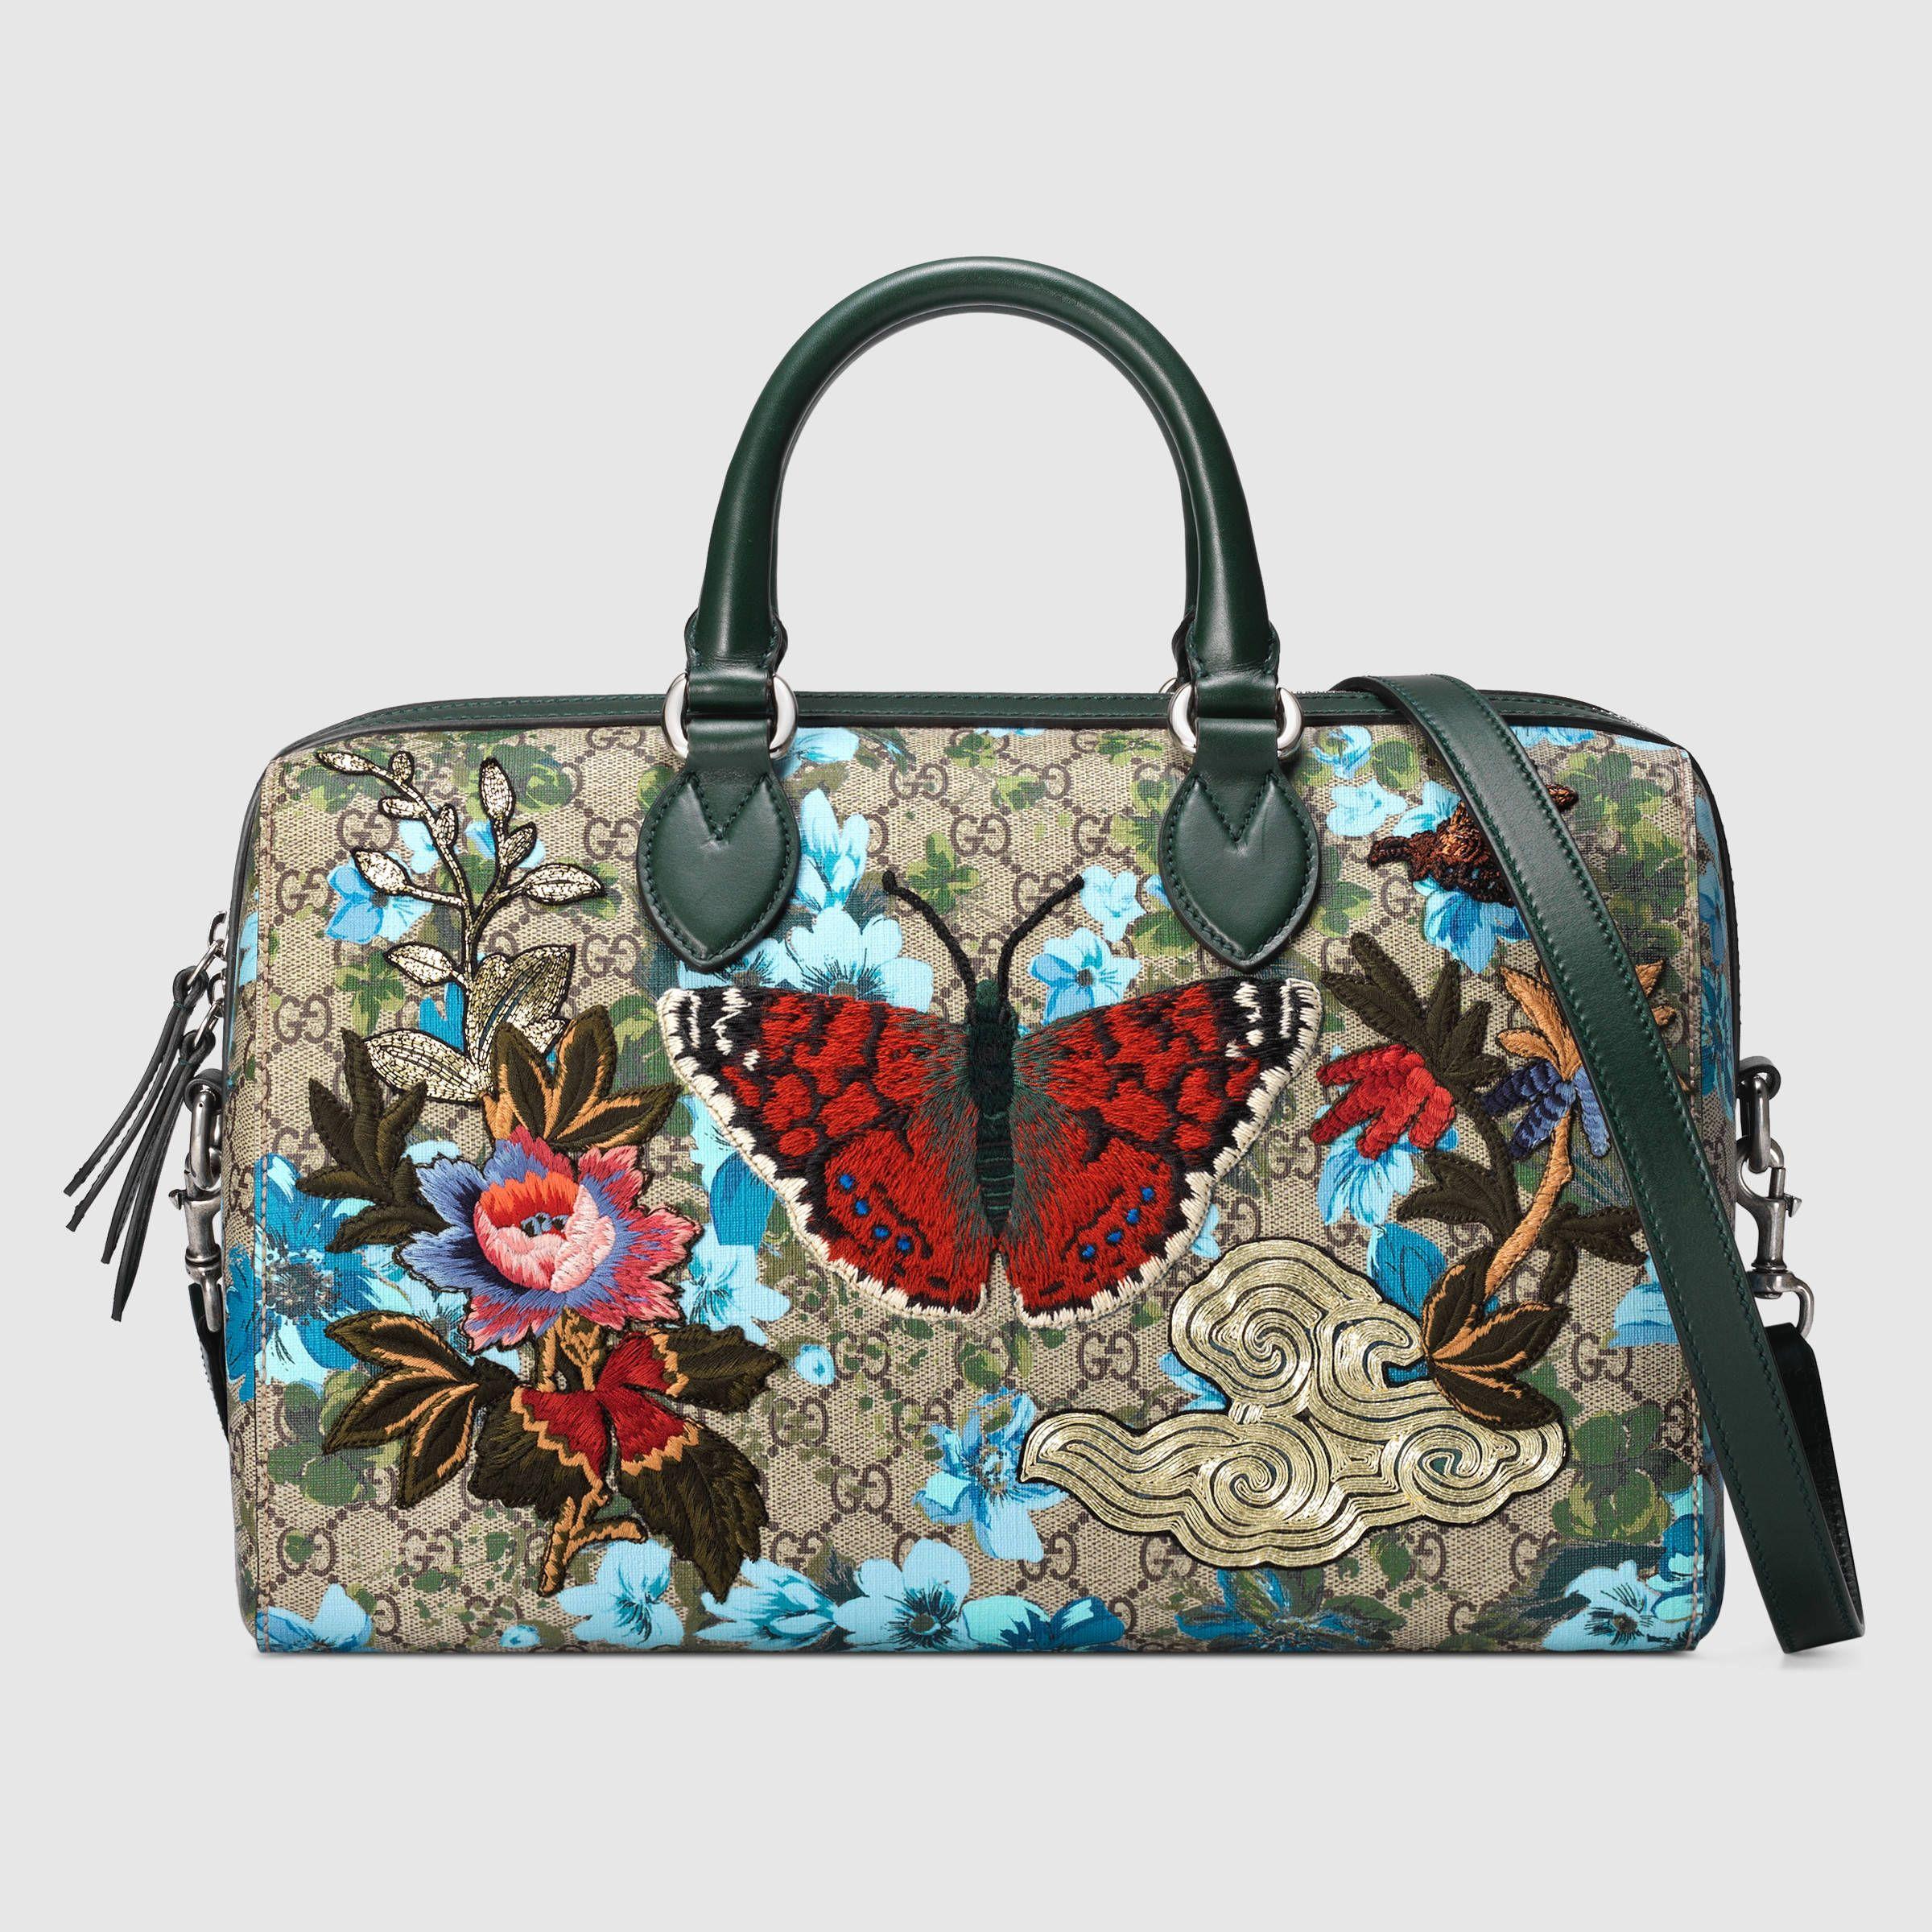 48574c36deb Gucci Fall 2016- GG floral print top handle Boston Bag   2,650 ...